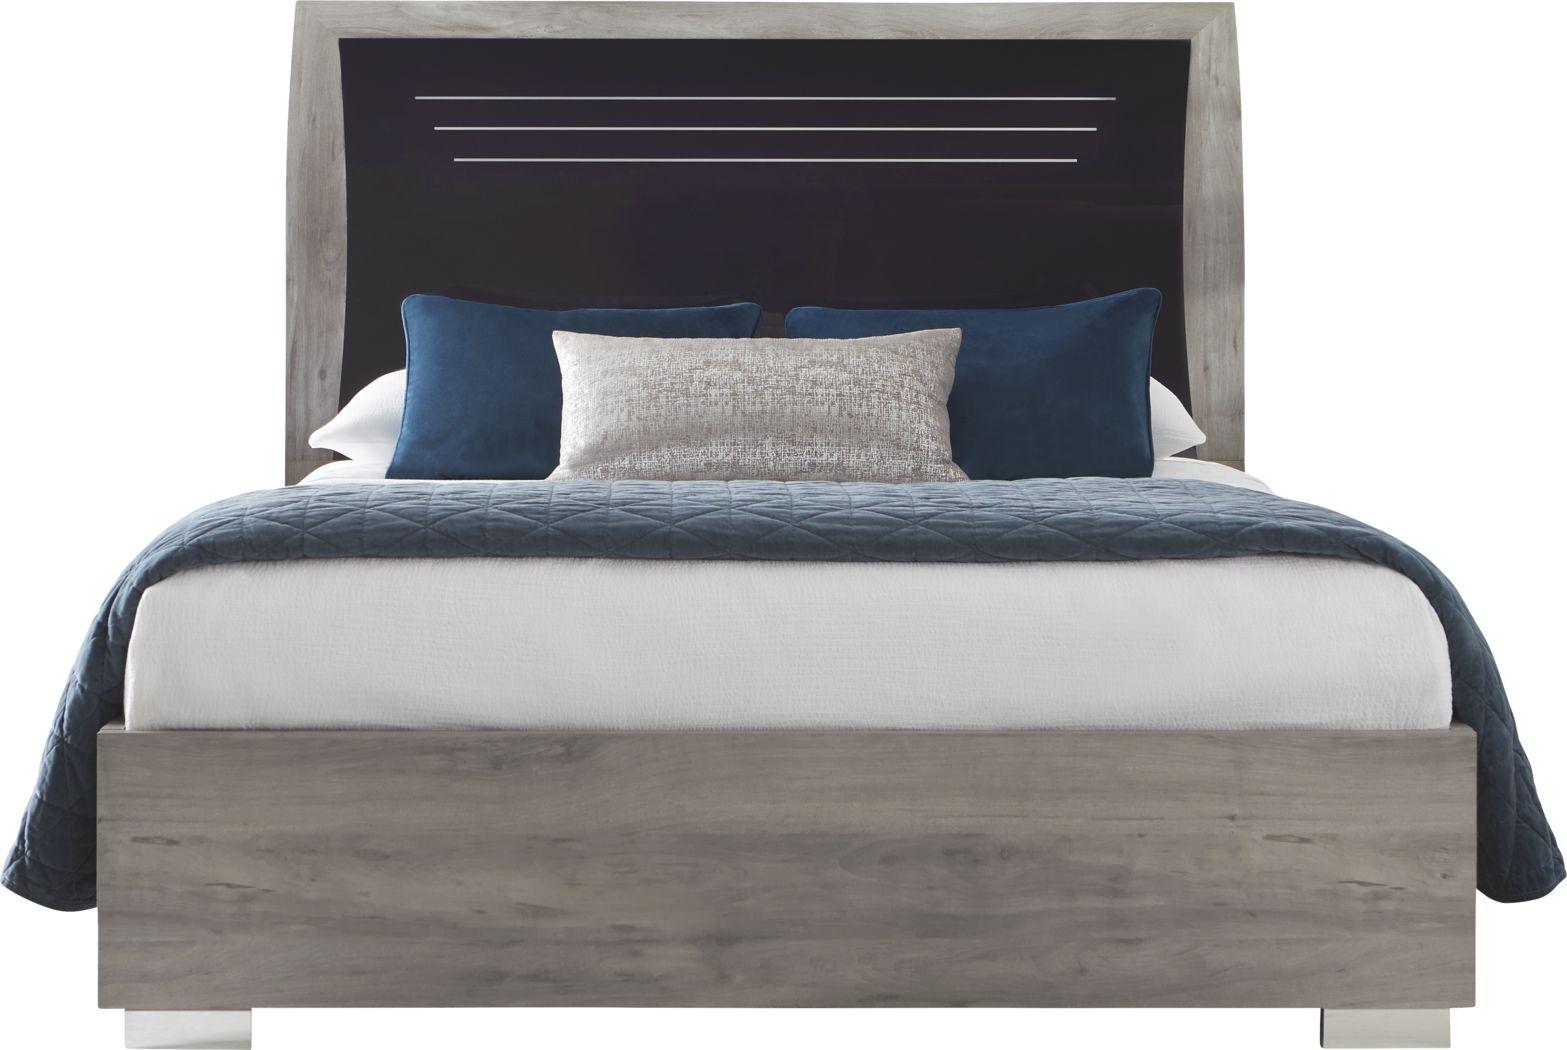 Buccone Heights Black 3 Pc Queen Bed